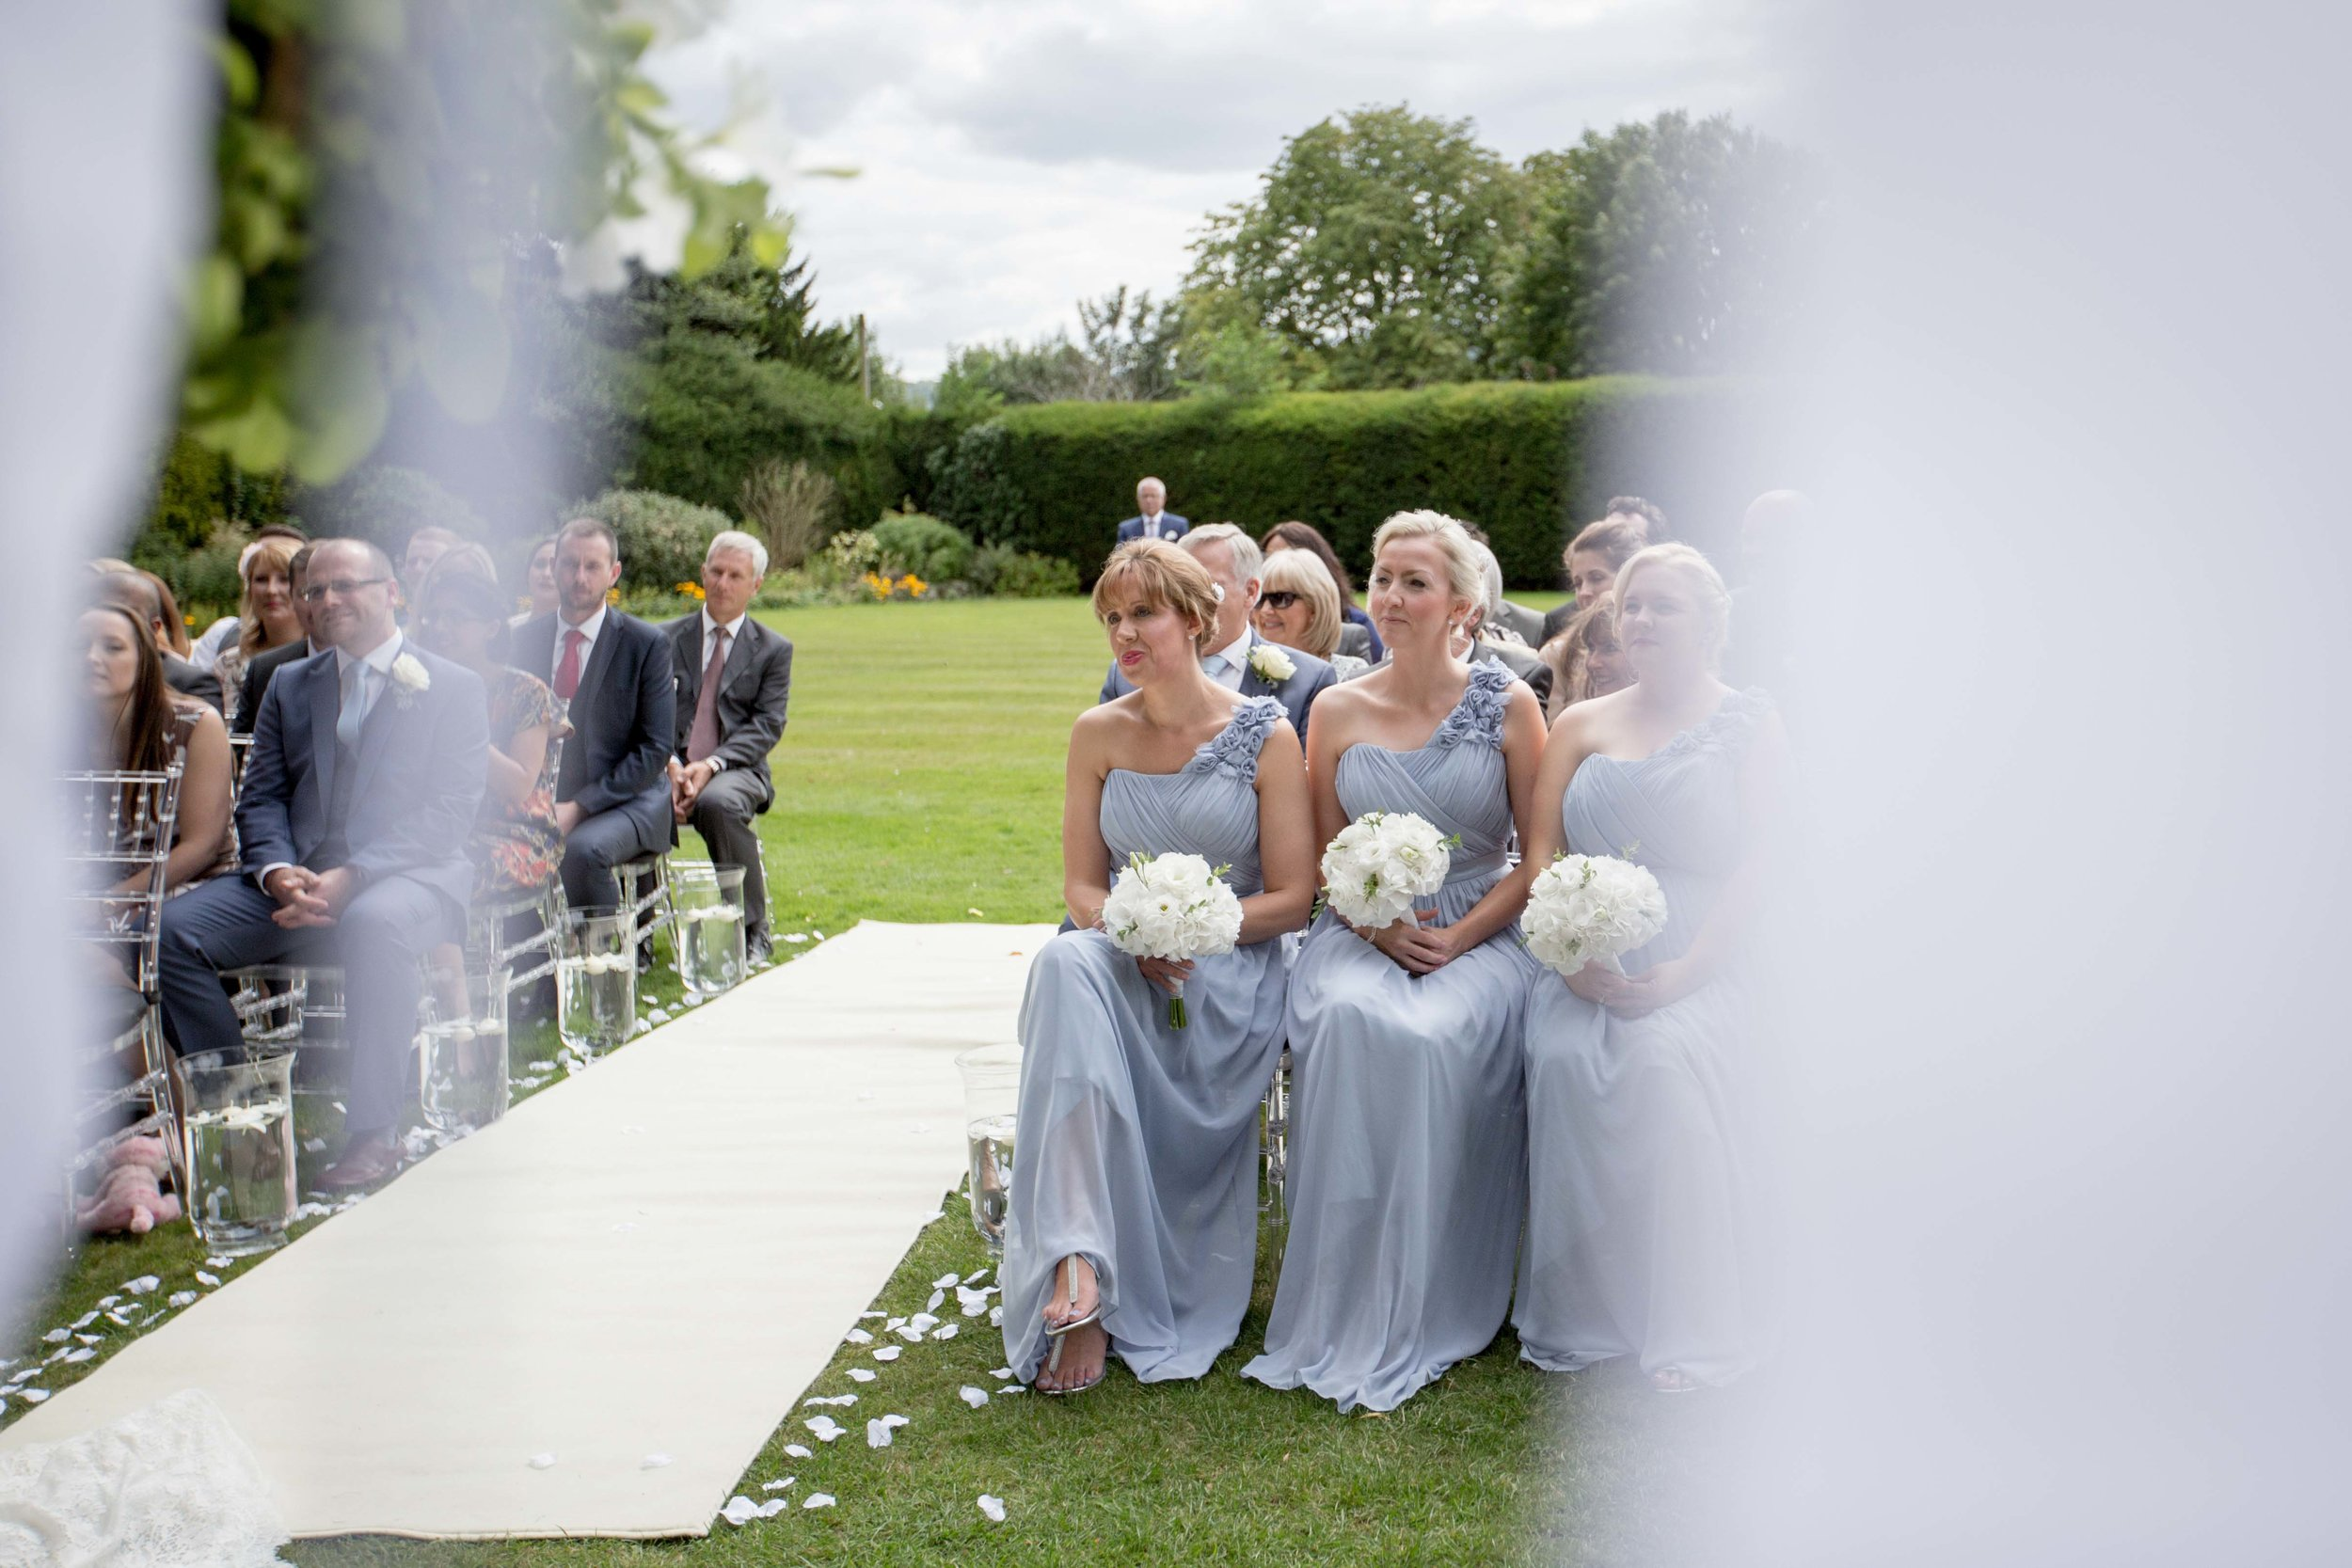 cotswold-wedding-photography-at-stonehouse-court-hotel-natalia-smith-photography-gloucestershire-wedding-photographer-36.jpg